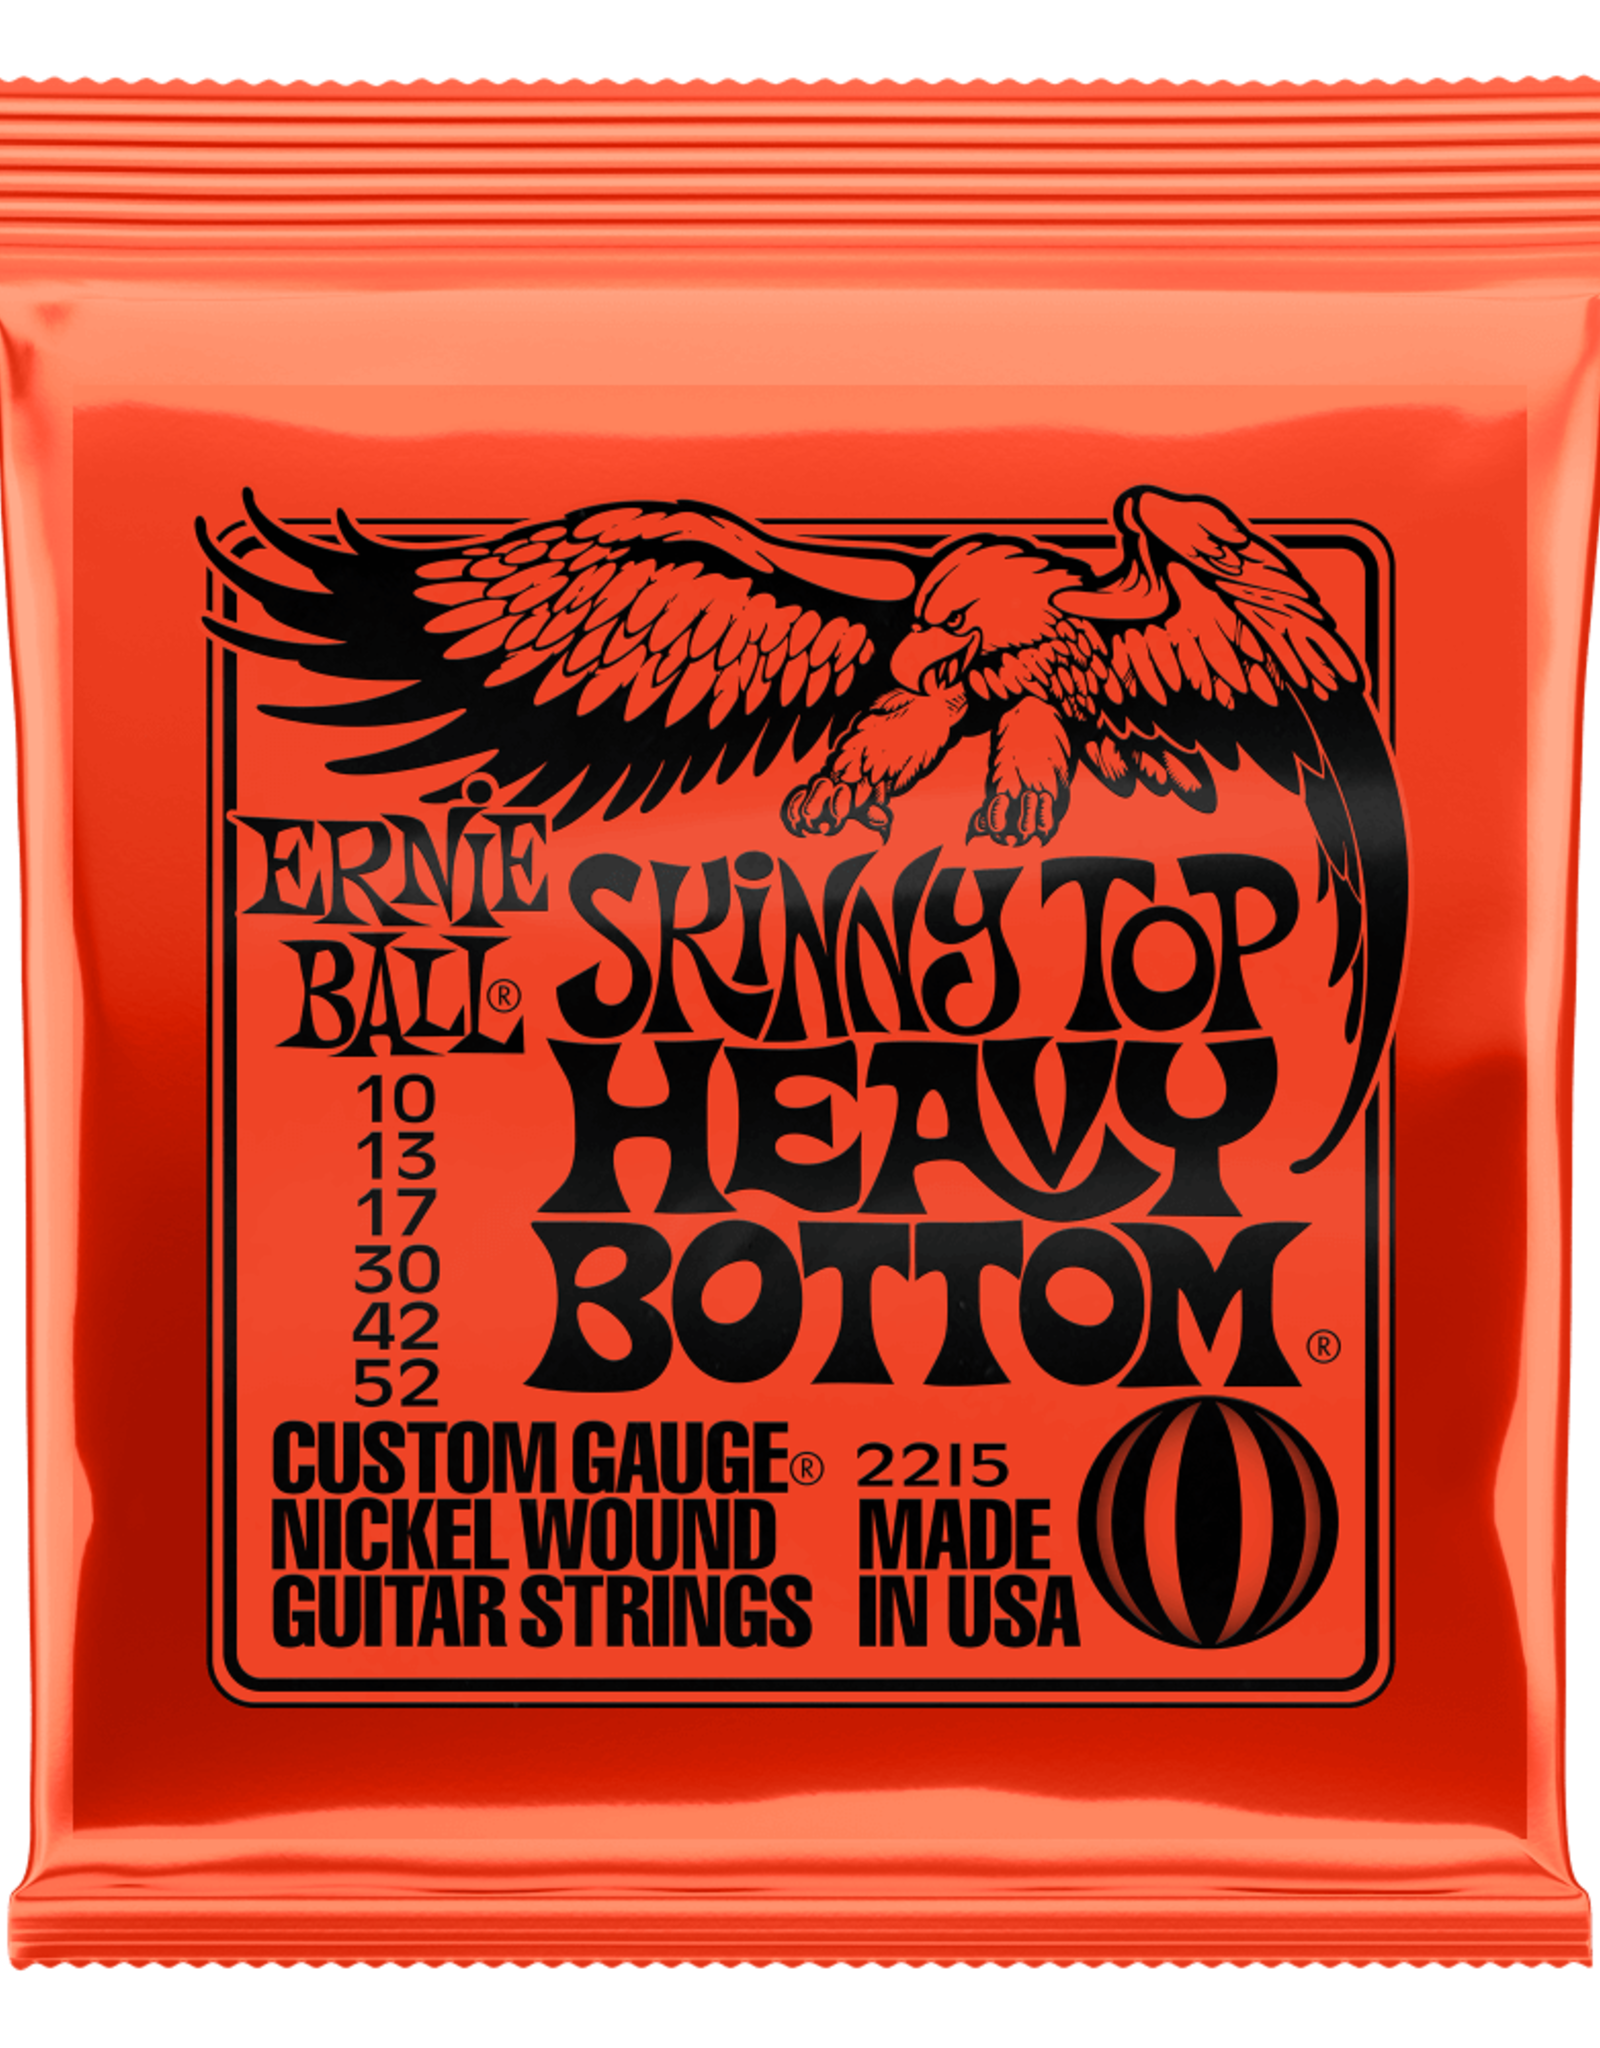 Ernie Ball Ernie Ball 10-52 Skinny Top Heavy Bottom Slinky Nickel Wound Electric Guitar Strings